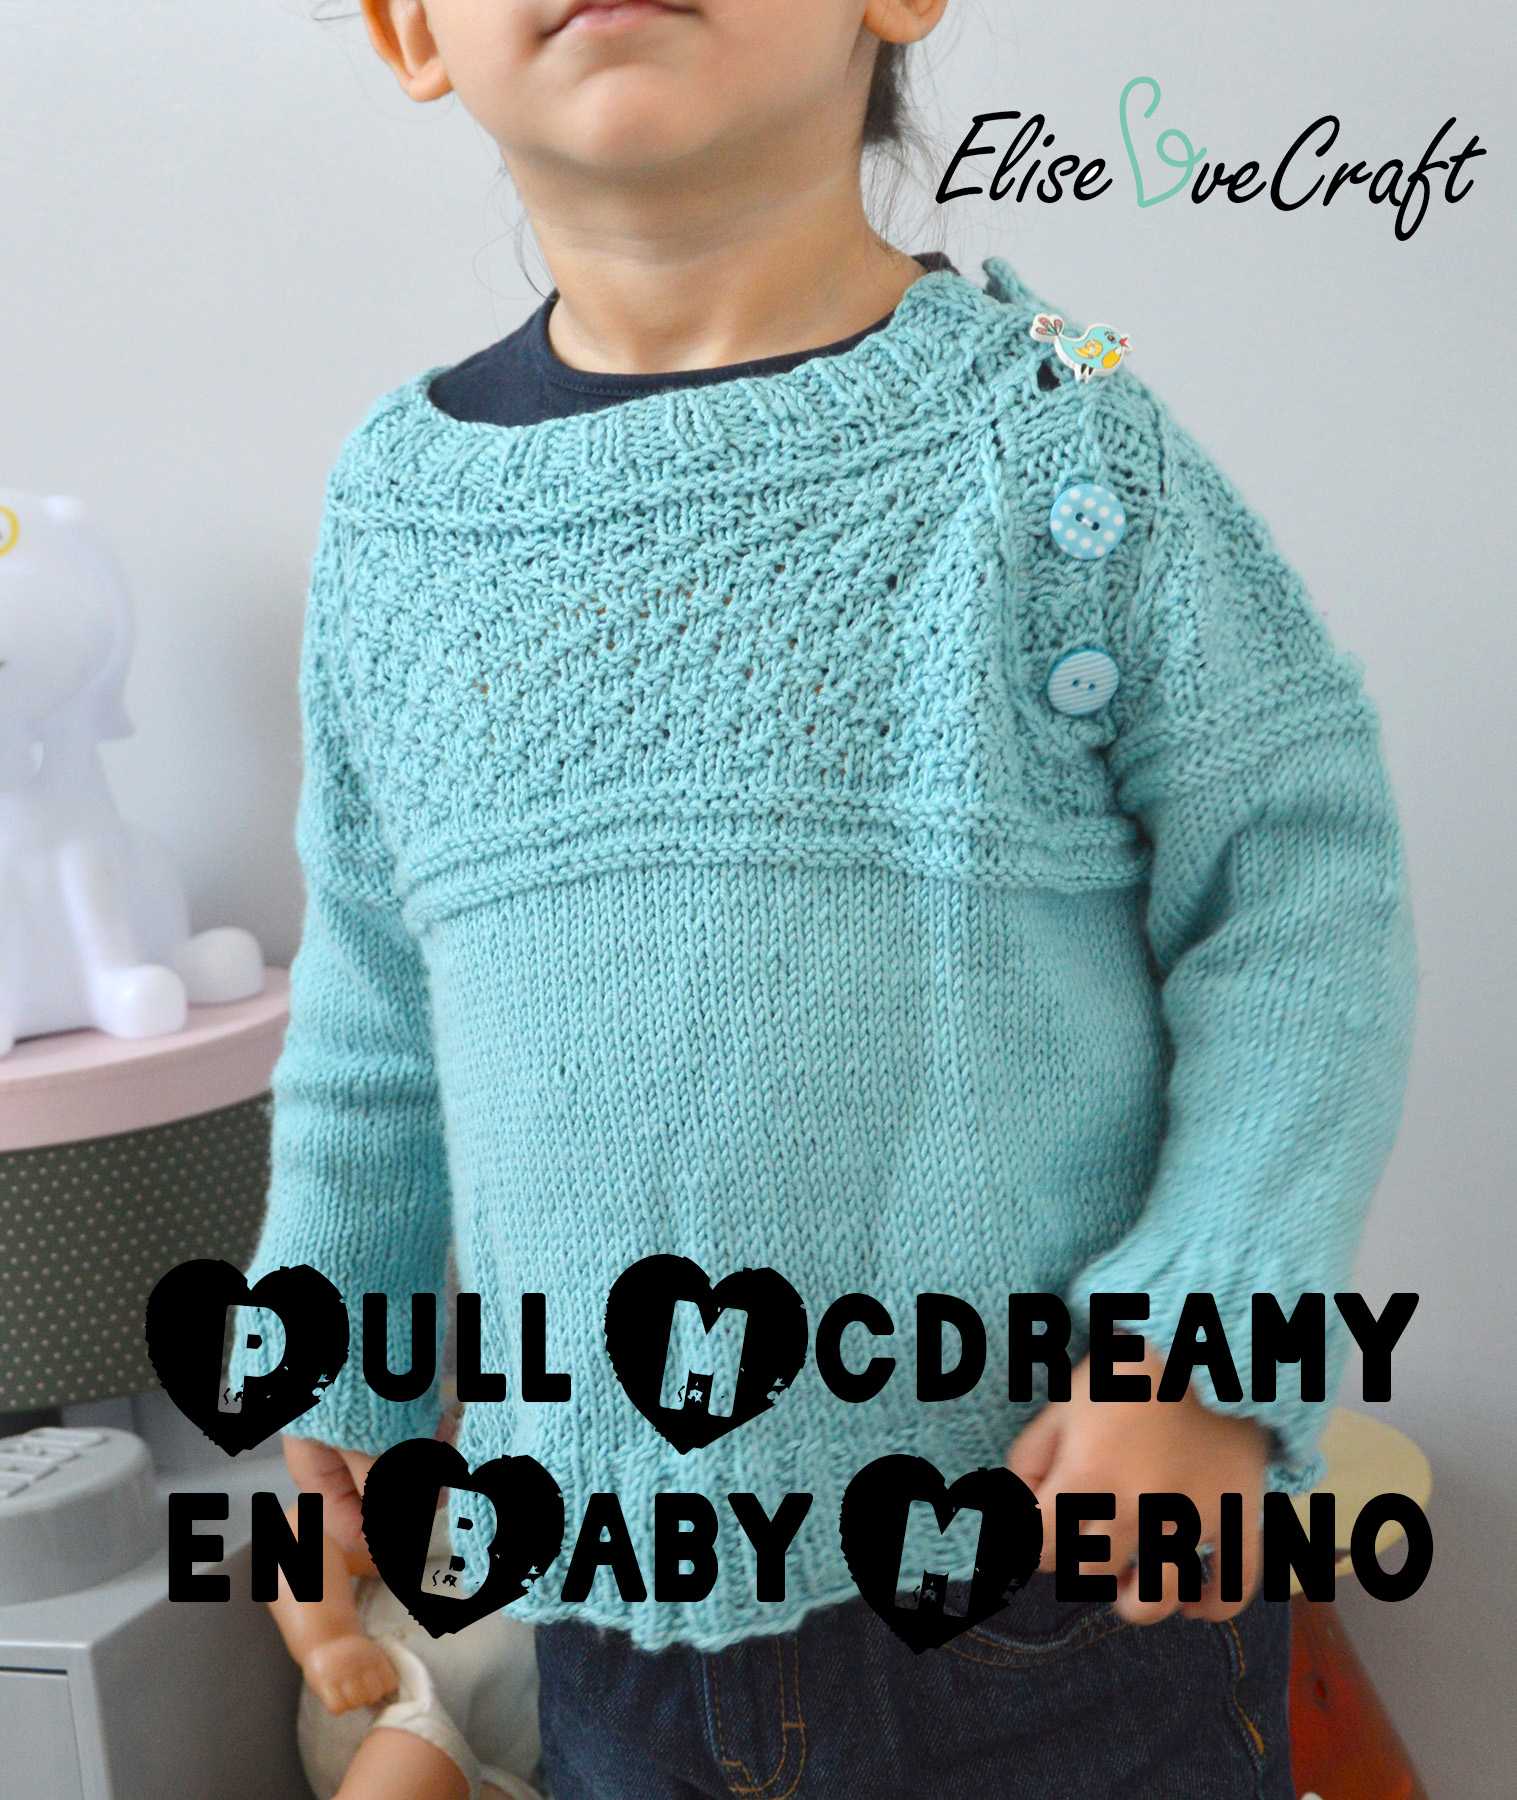 pull Mcdreamy Drops